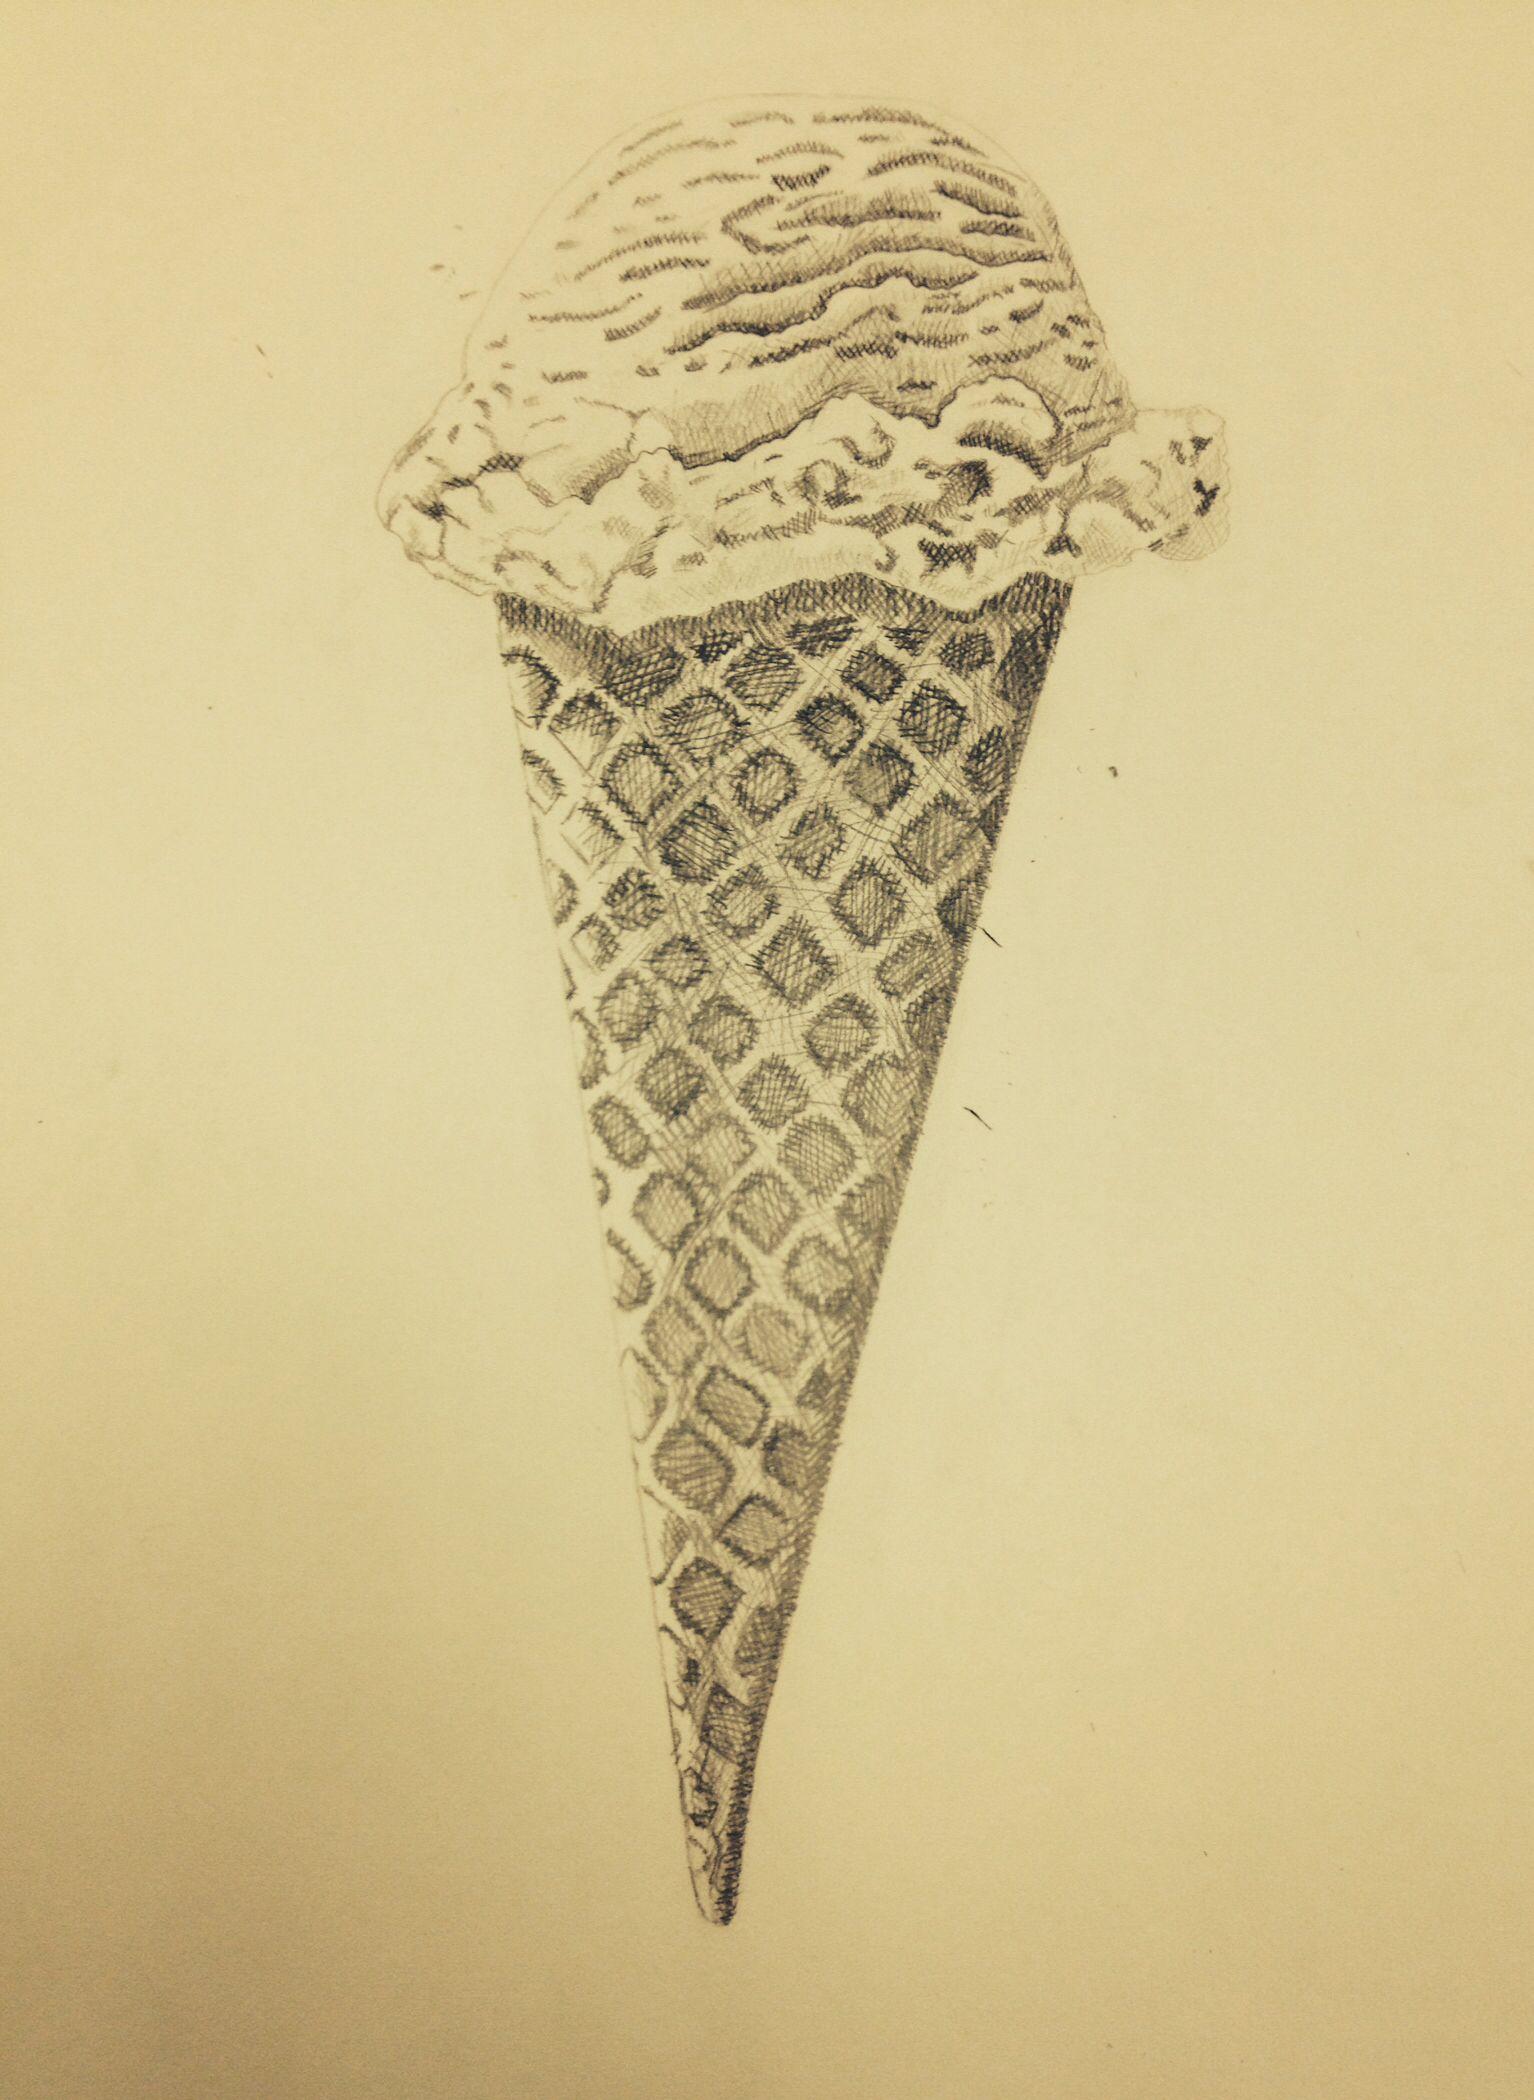 Cross Hatched Ice Cream Artsy Fartsy Artsy Ice Cream